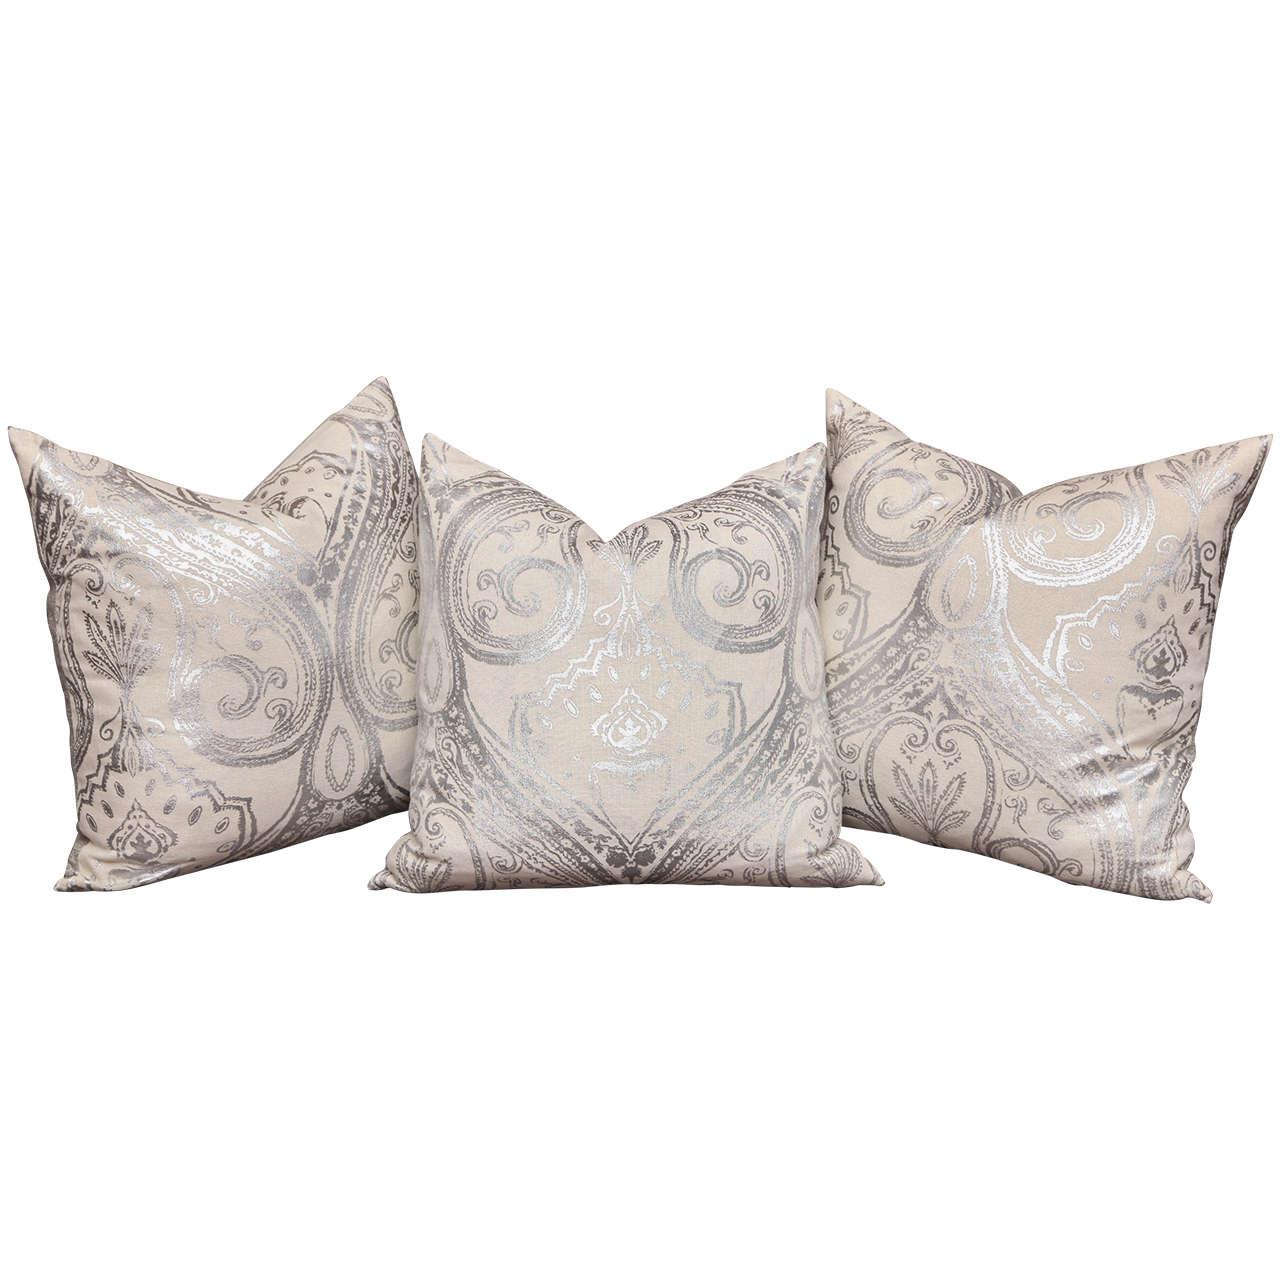 Custom-Made Hand-Painted Metallic Pillows